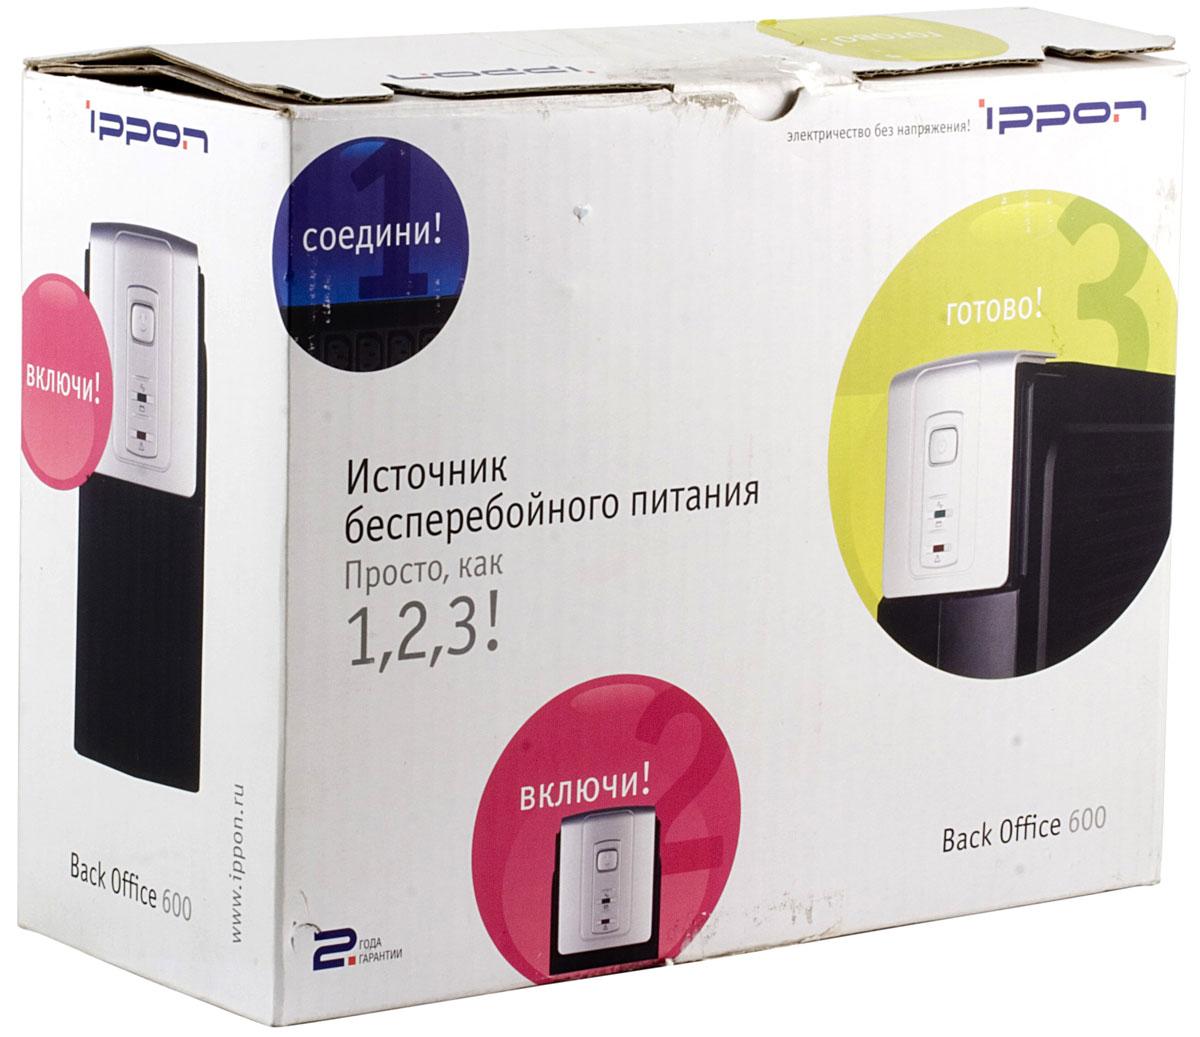 Коробка ippon back office 600